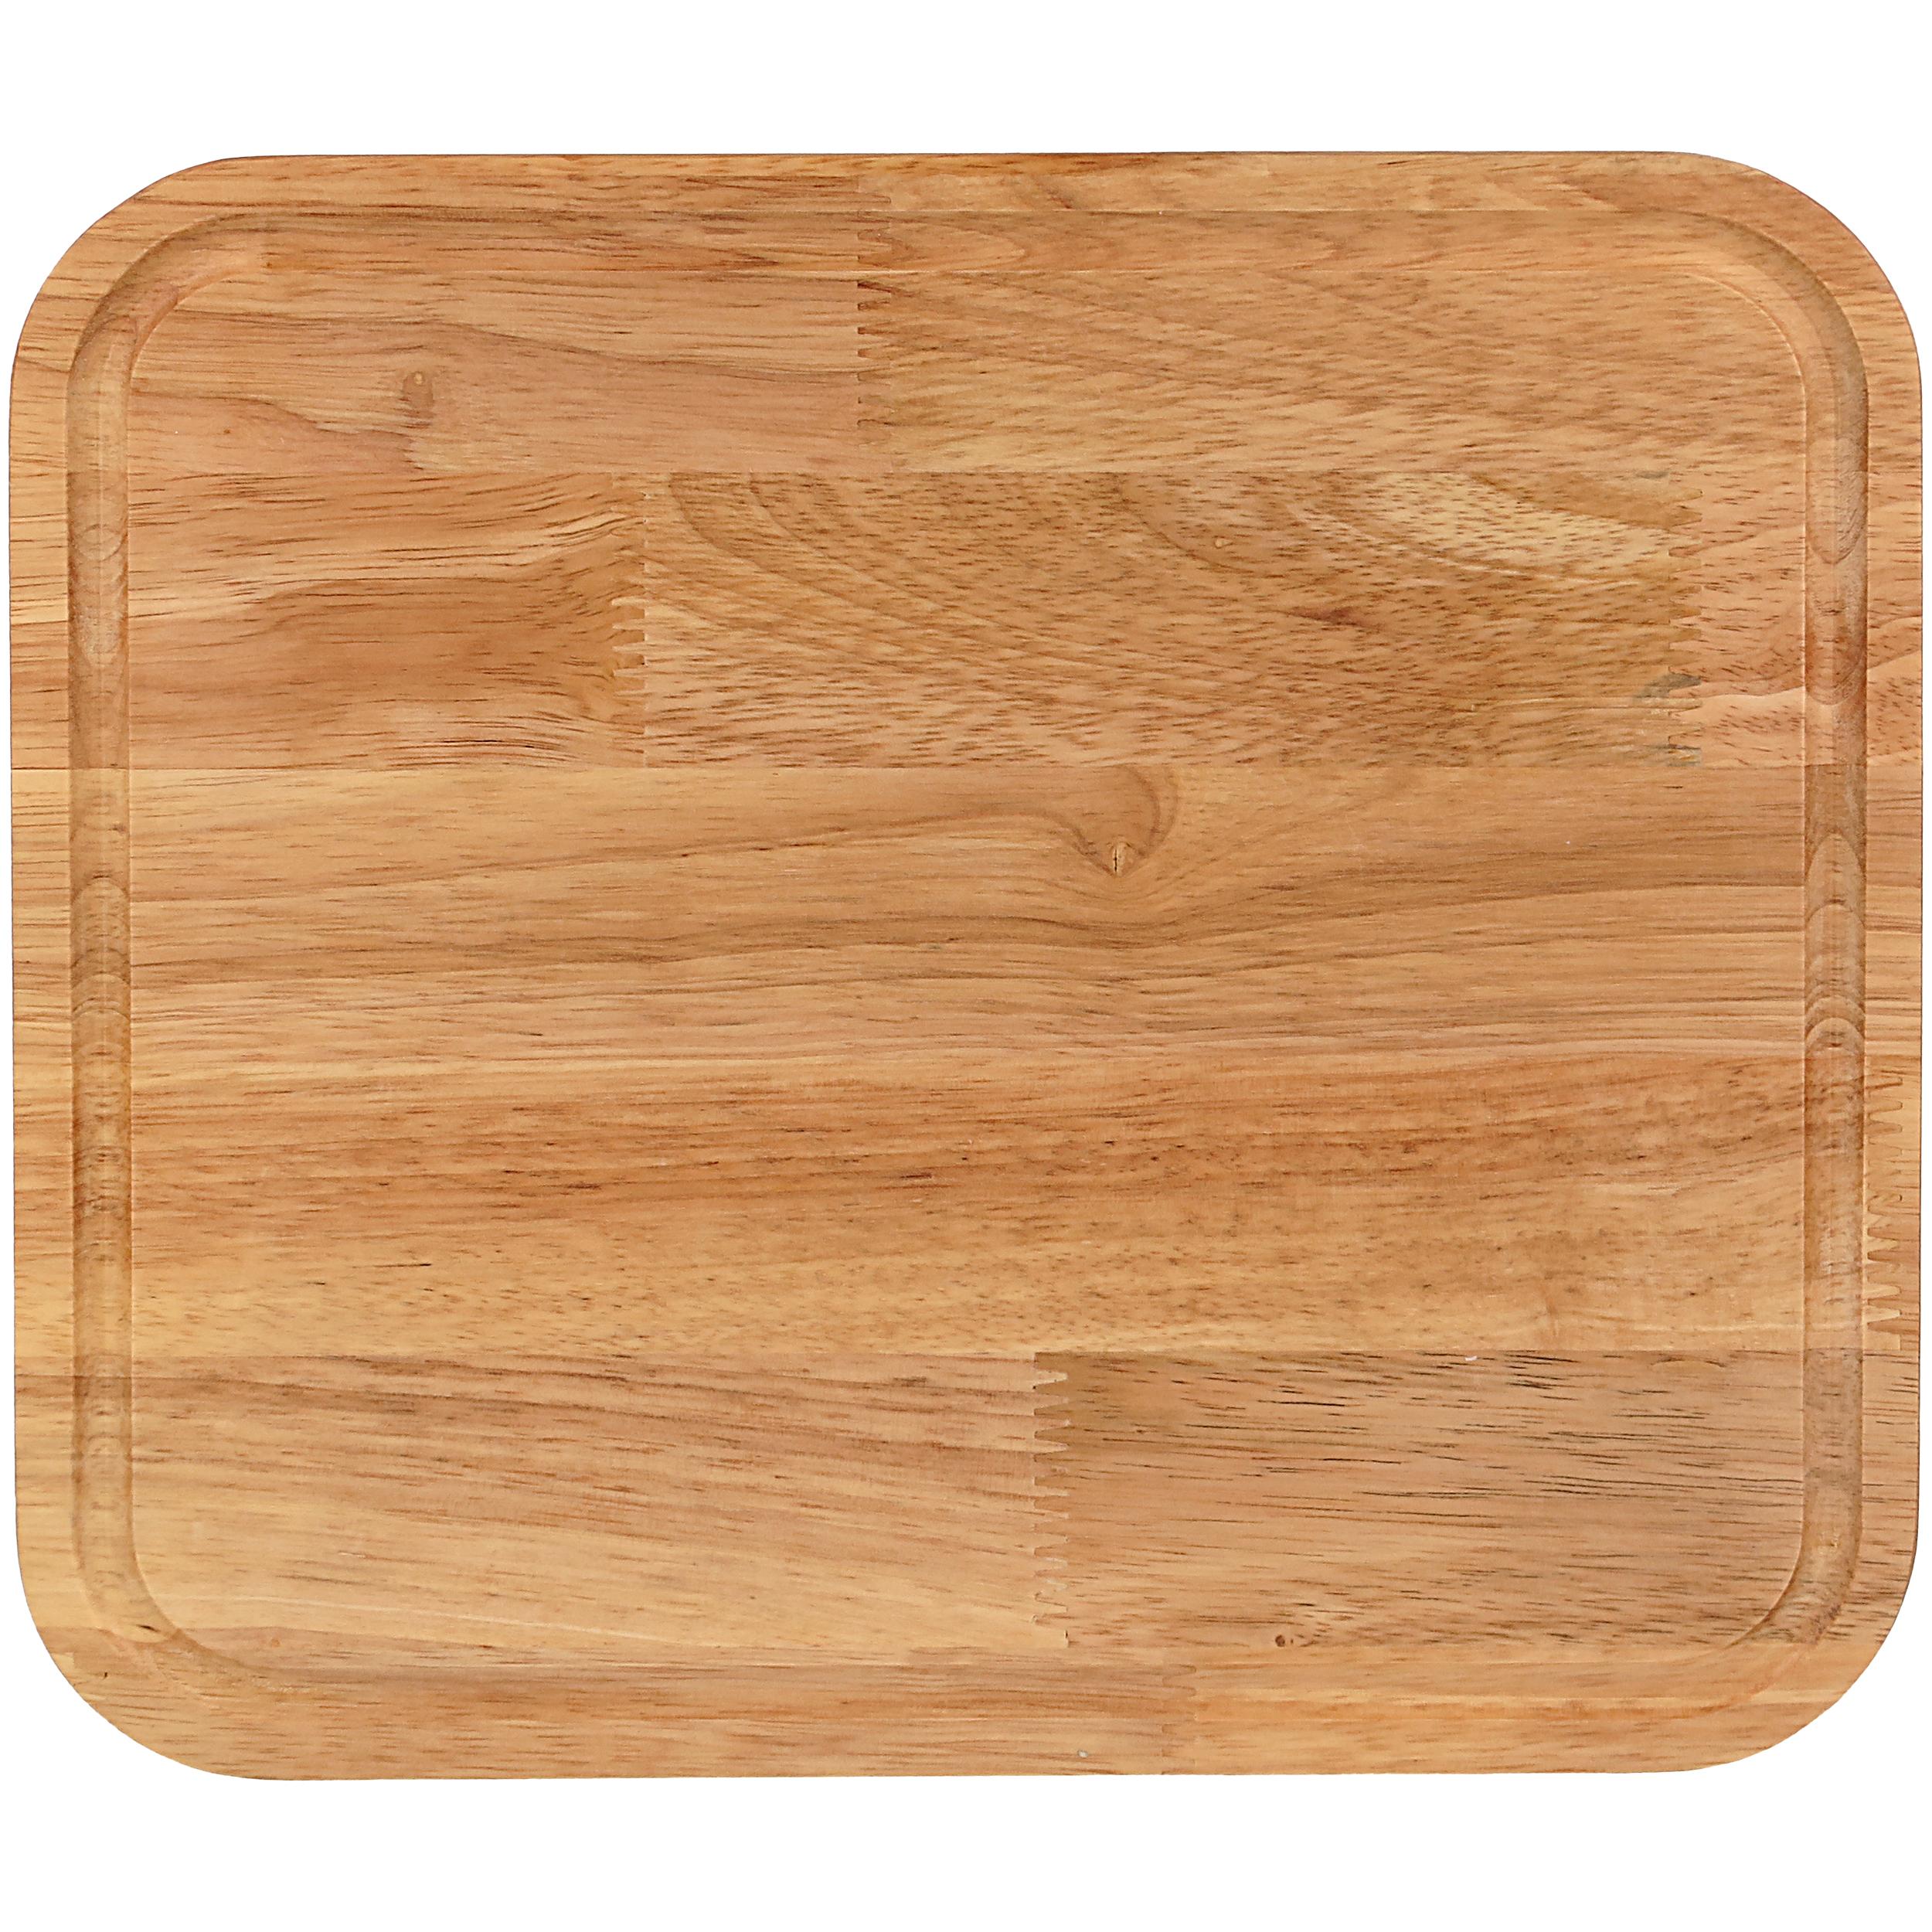 تخته گوشت مدل بامبو